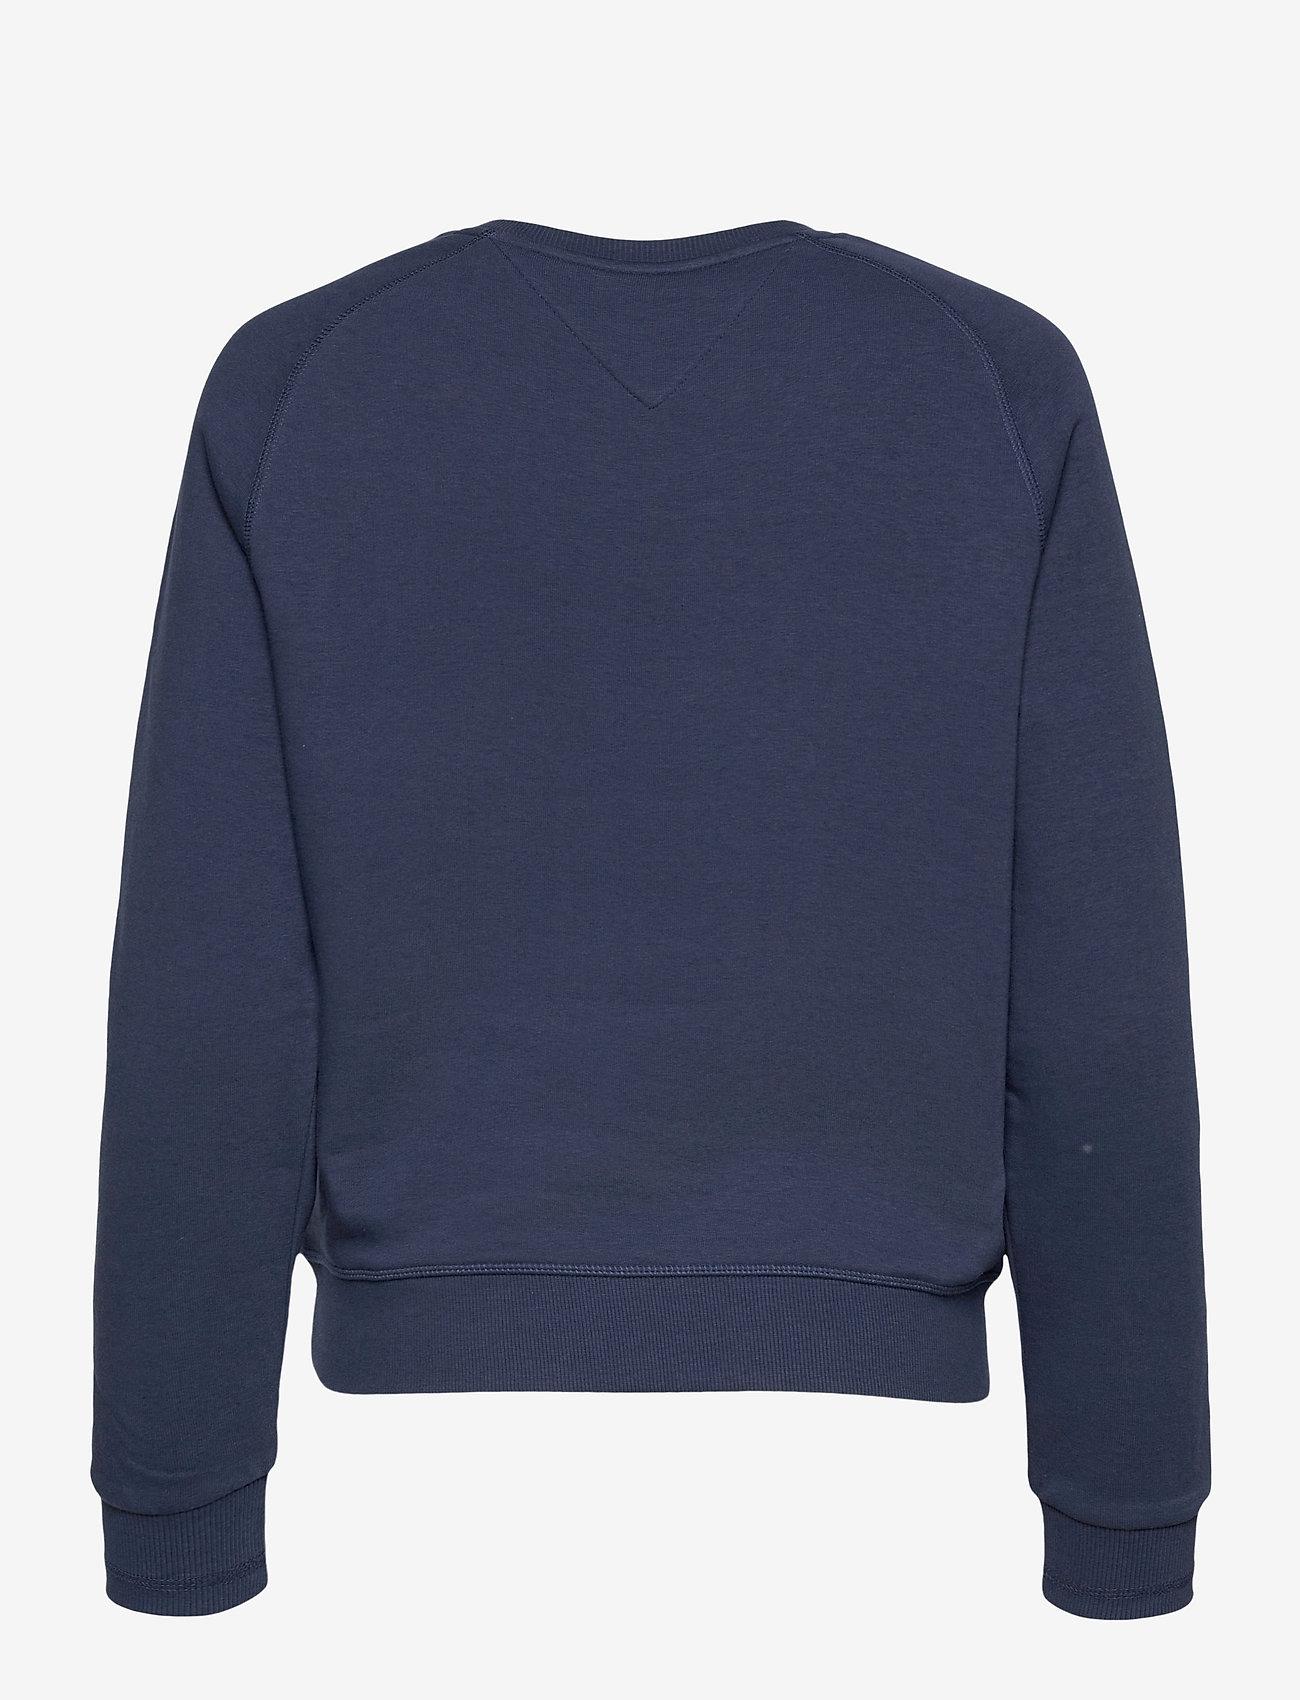 Tommy Jeans - TJW BXY TIMELESS BOX SWEATSHIRT - sweatshirts & hoodies - twilight navy - 1